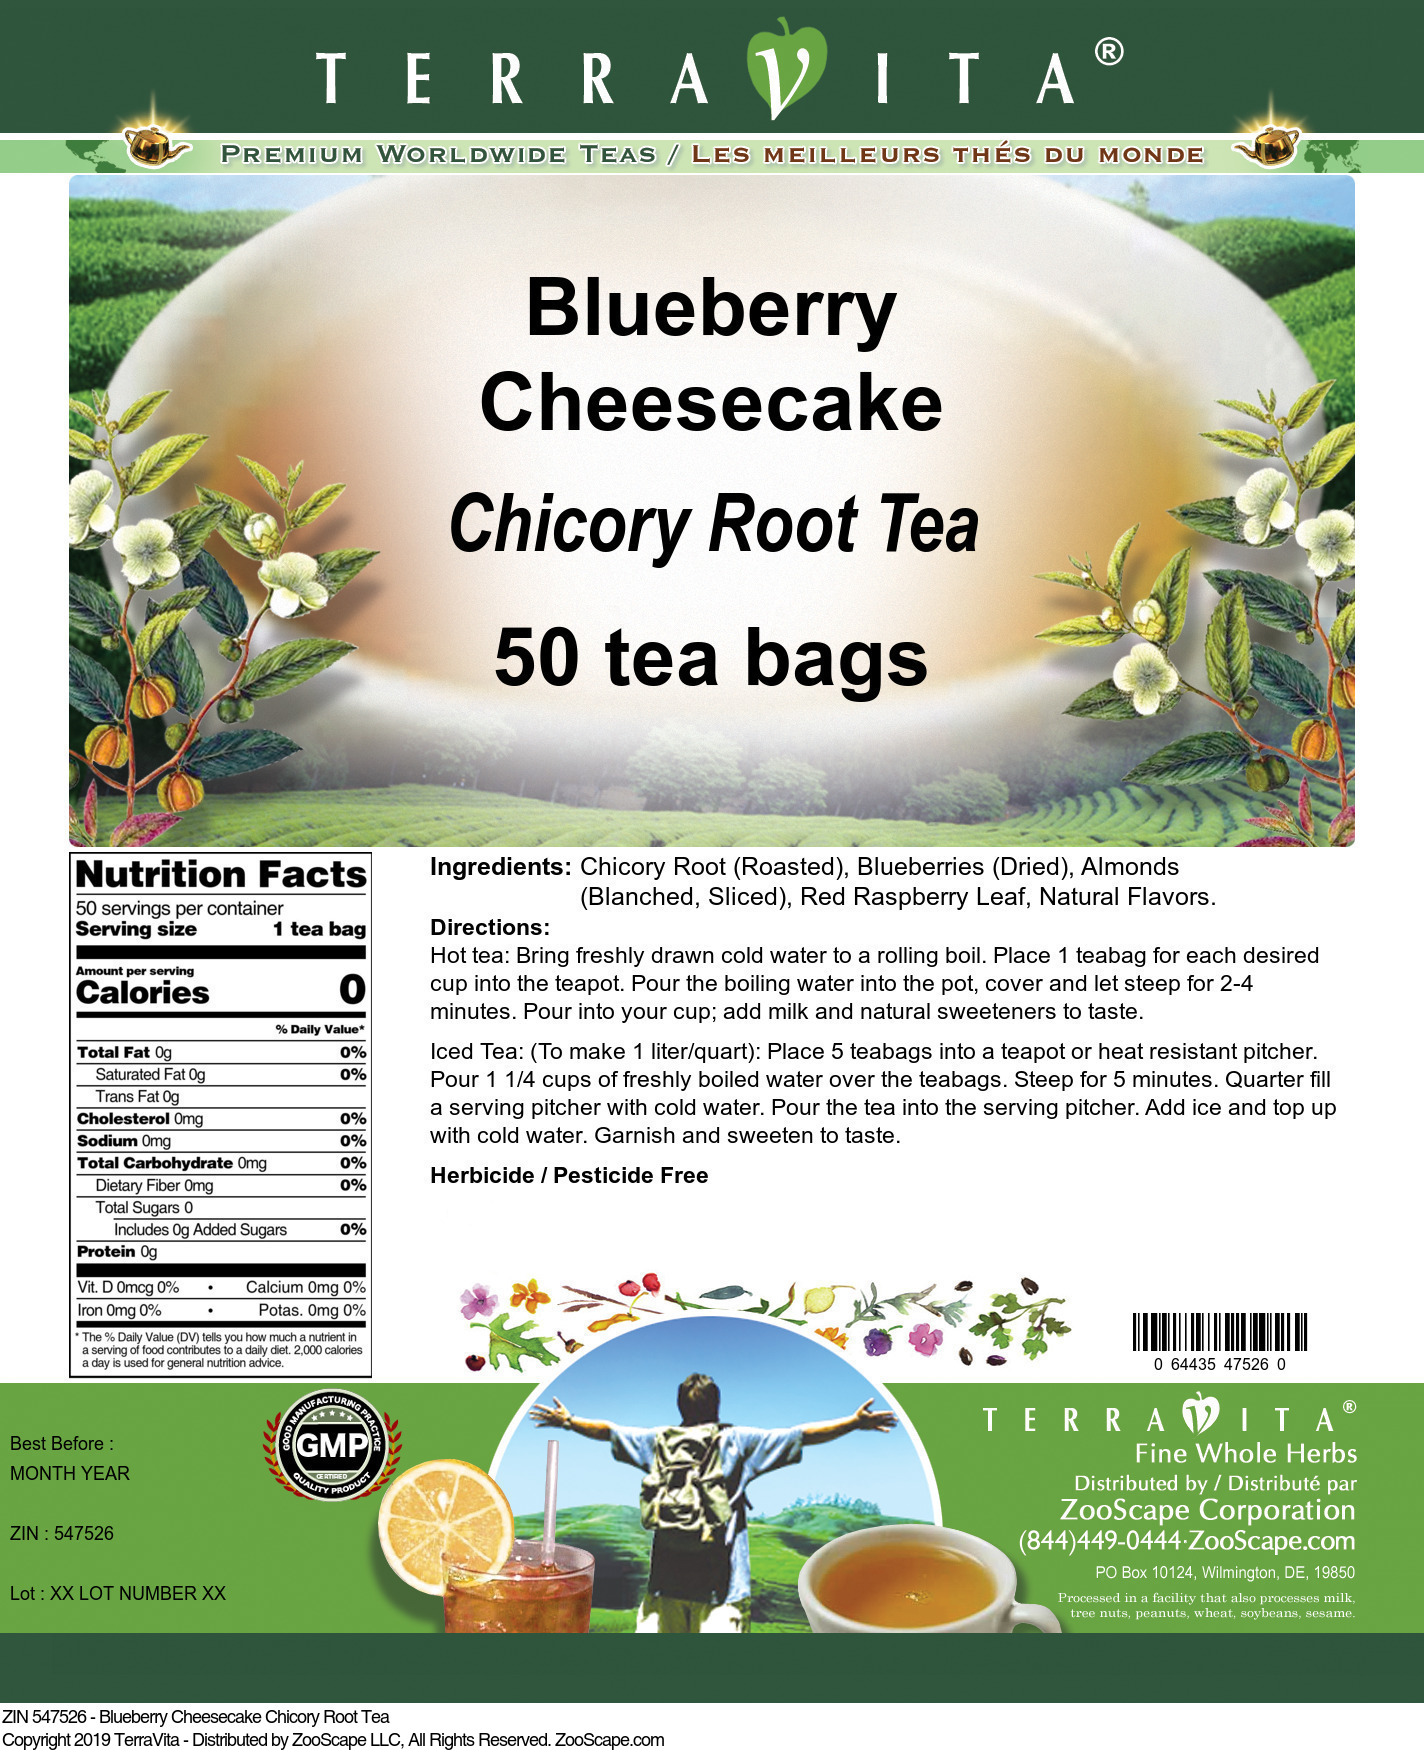 Blueberry Cheesecake Chicory Root